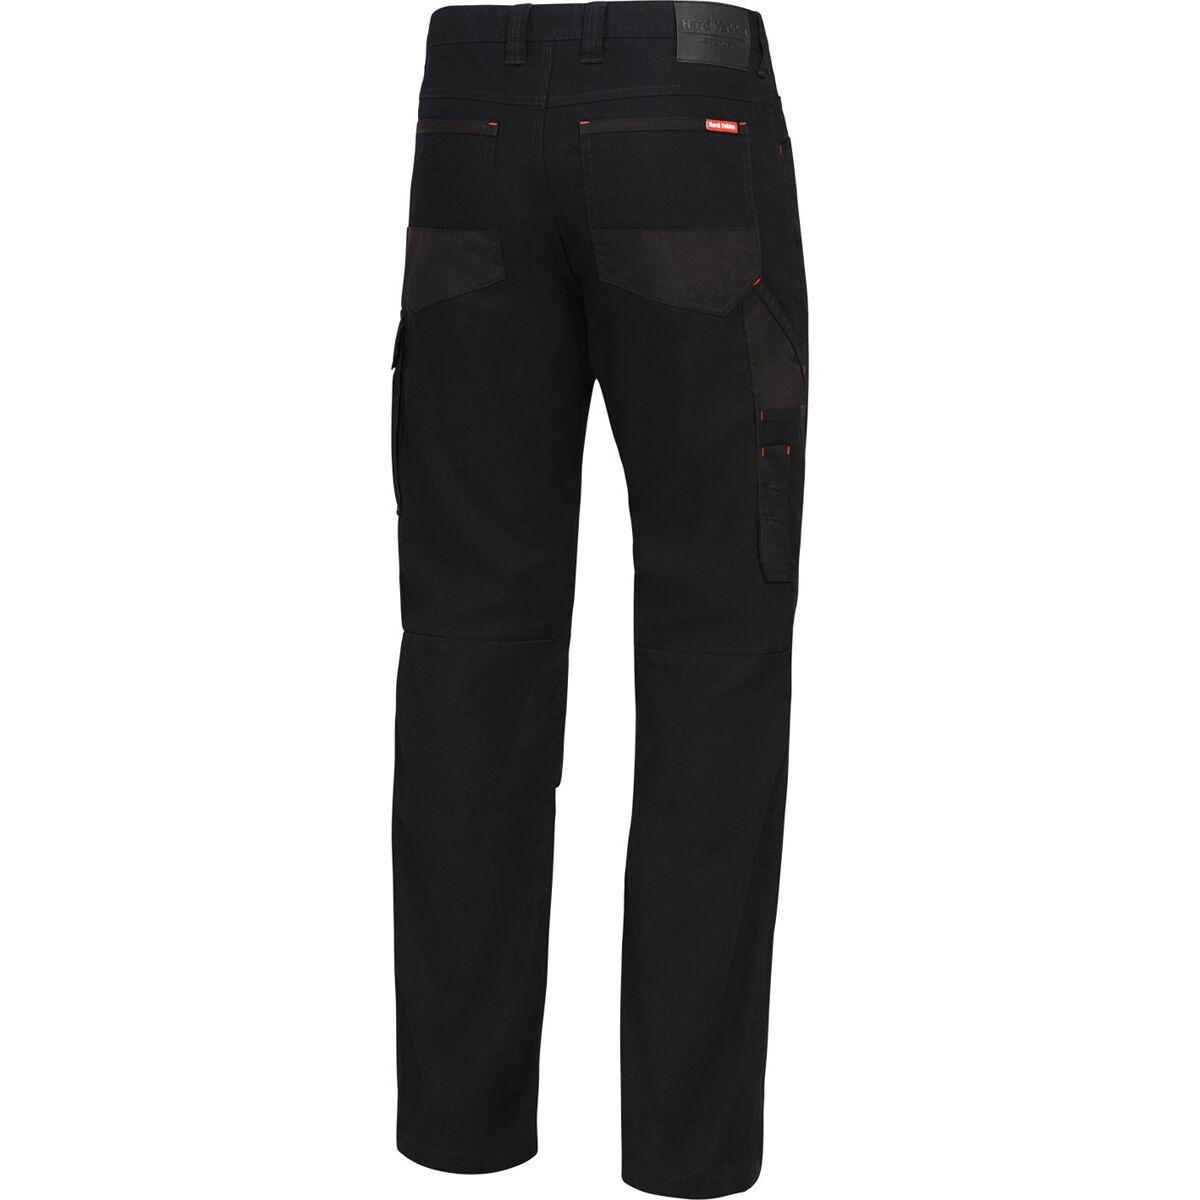 Hard Yakka Work Pants Men 87s Pants Clothing, Shoes & Accessories